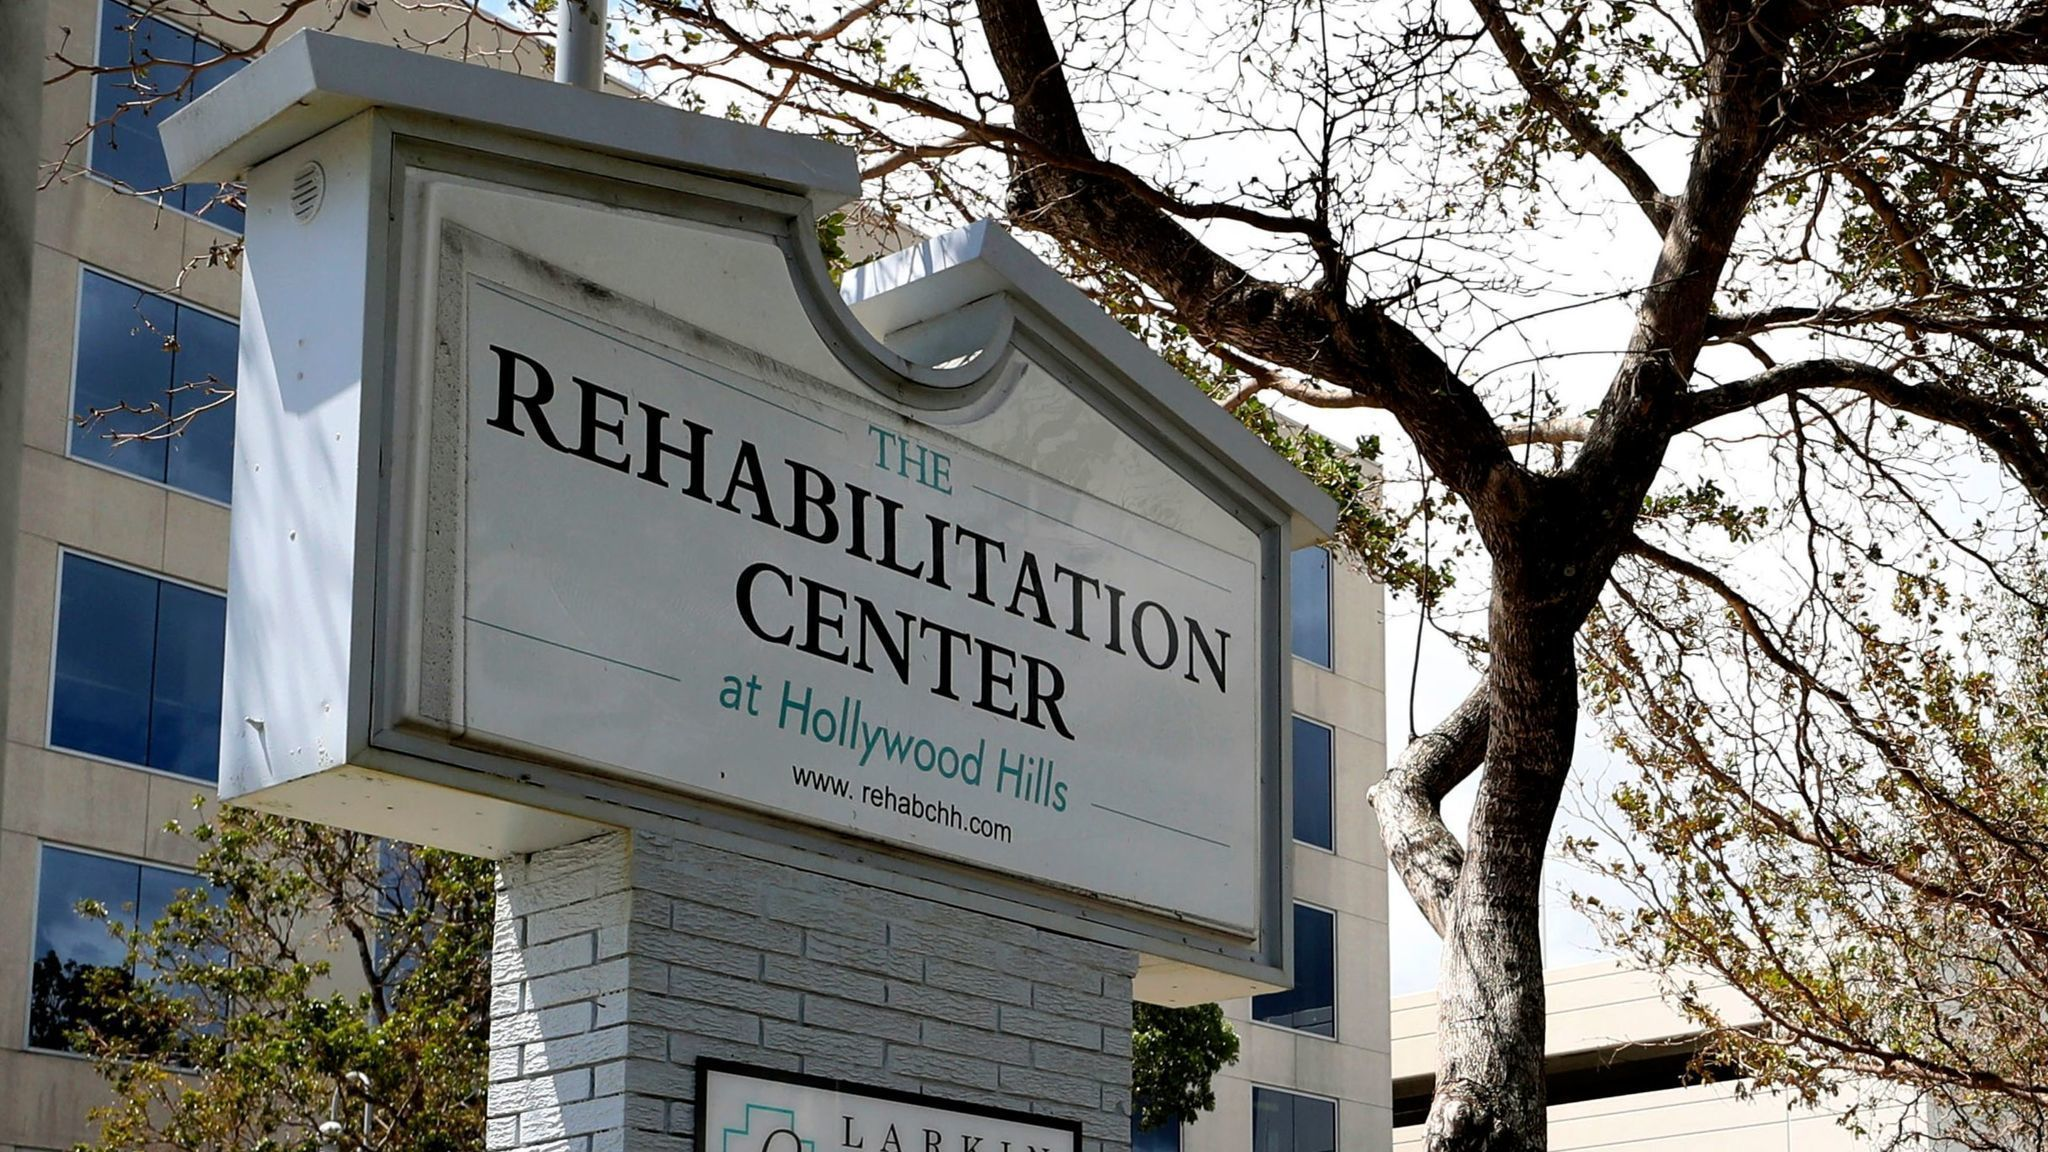 911 Calls Capture Staffs Alarm At Hollywood Nursing Home Sun Sentinel